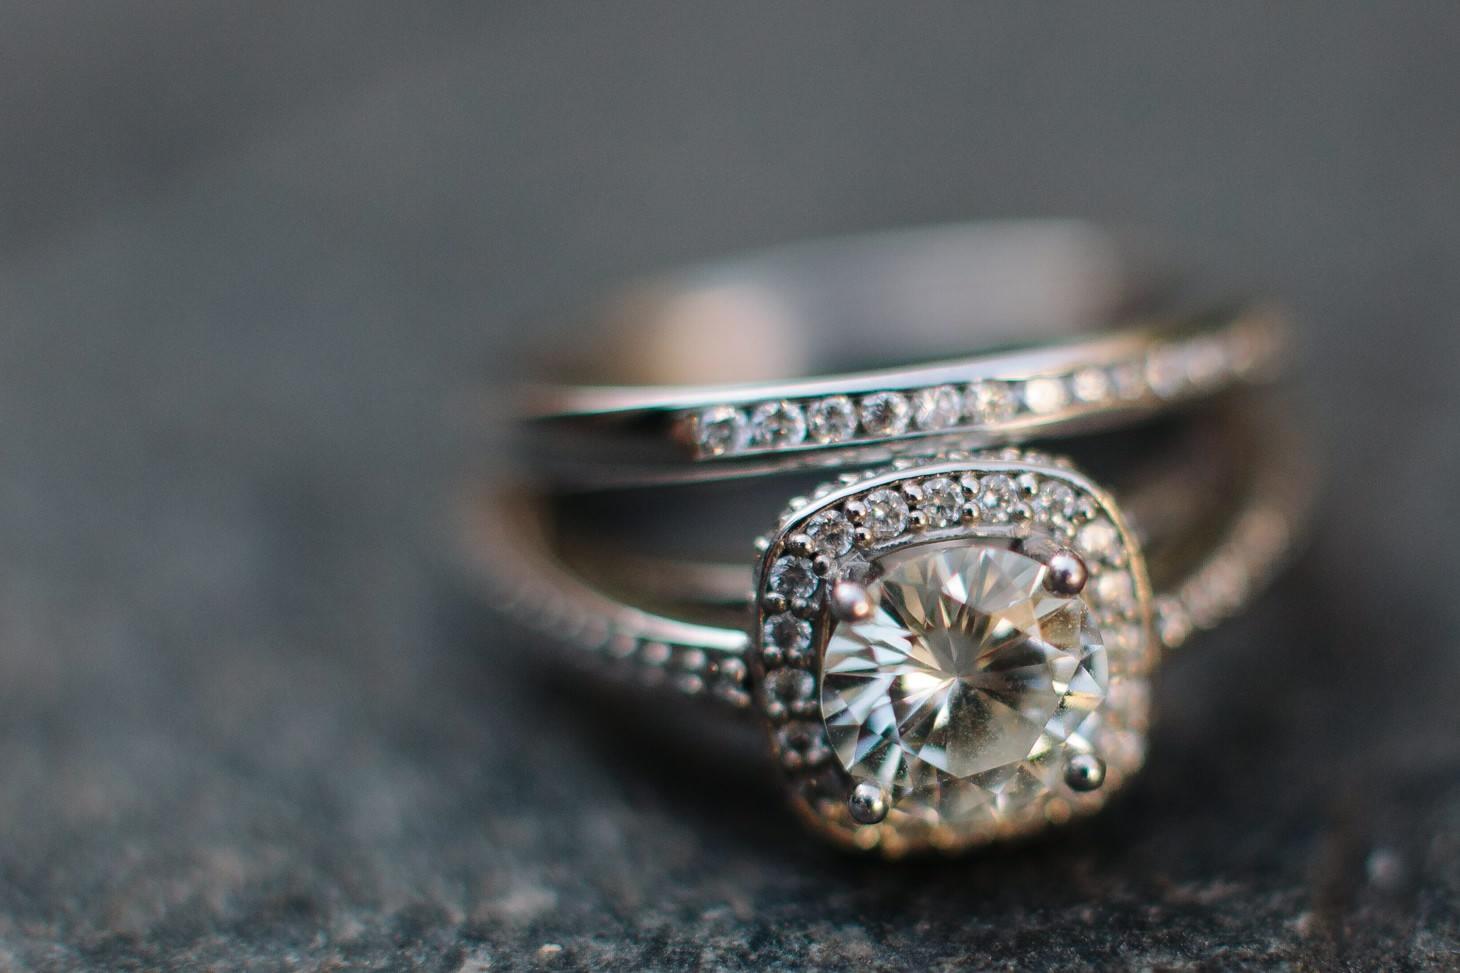 010-nyc-wedding-elopement-lgbt-friendly-photographer-city-hall-grand-central.jpg